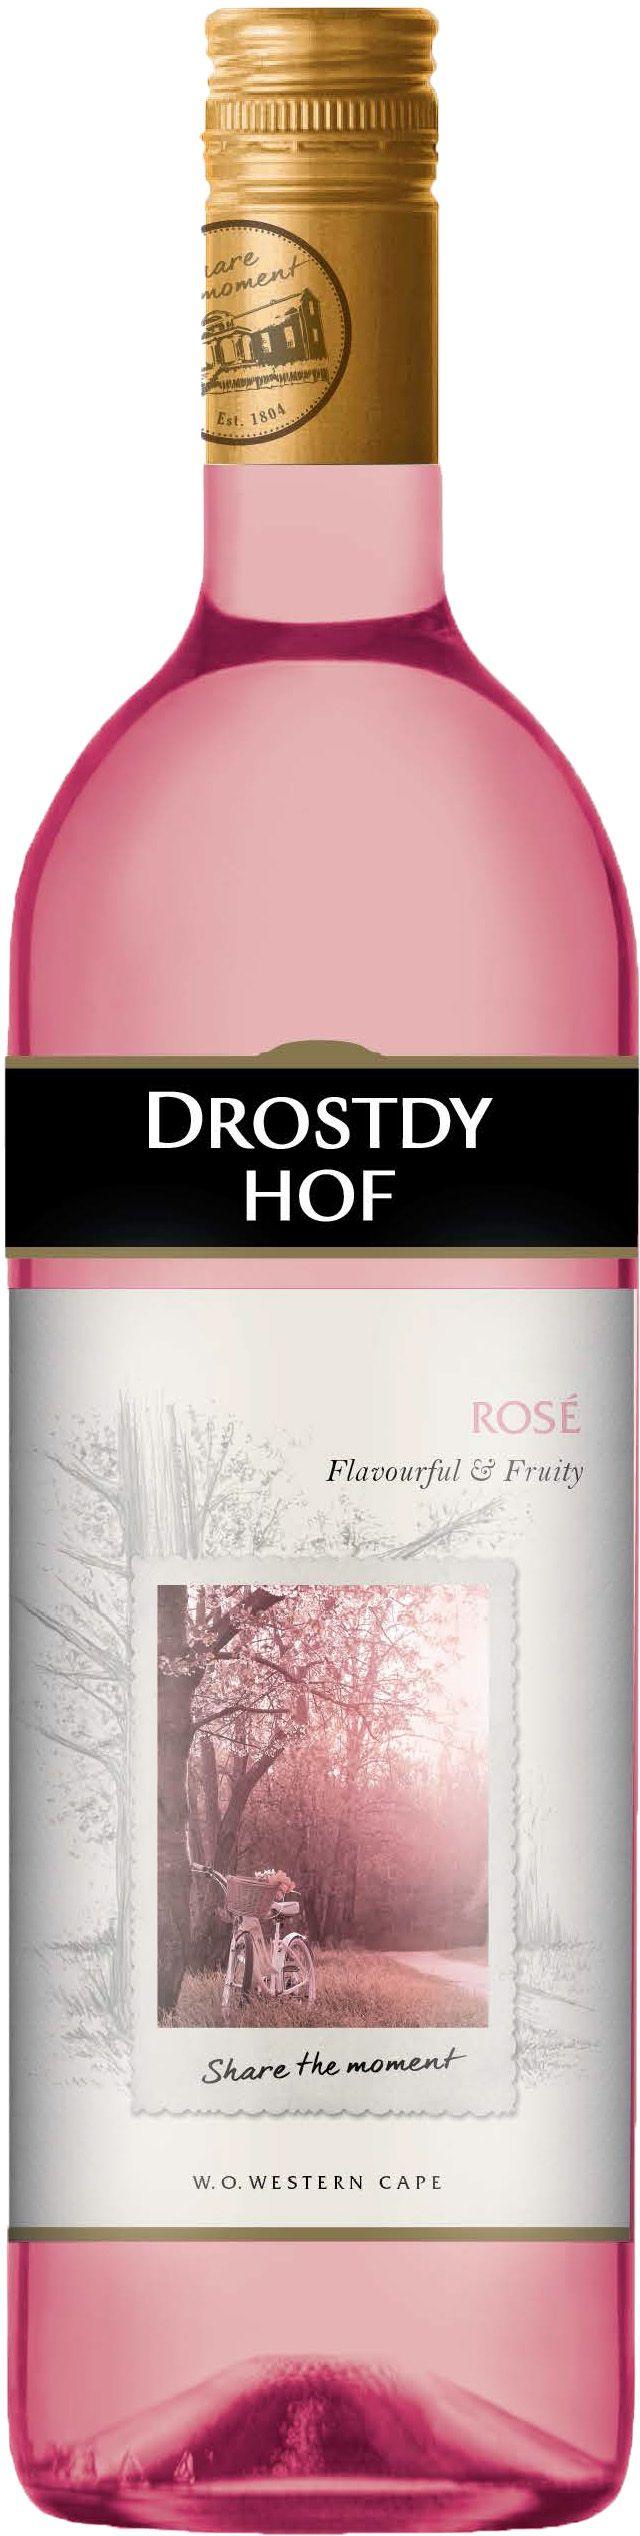 Drostdy Hof Rosé